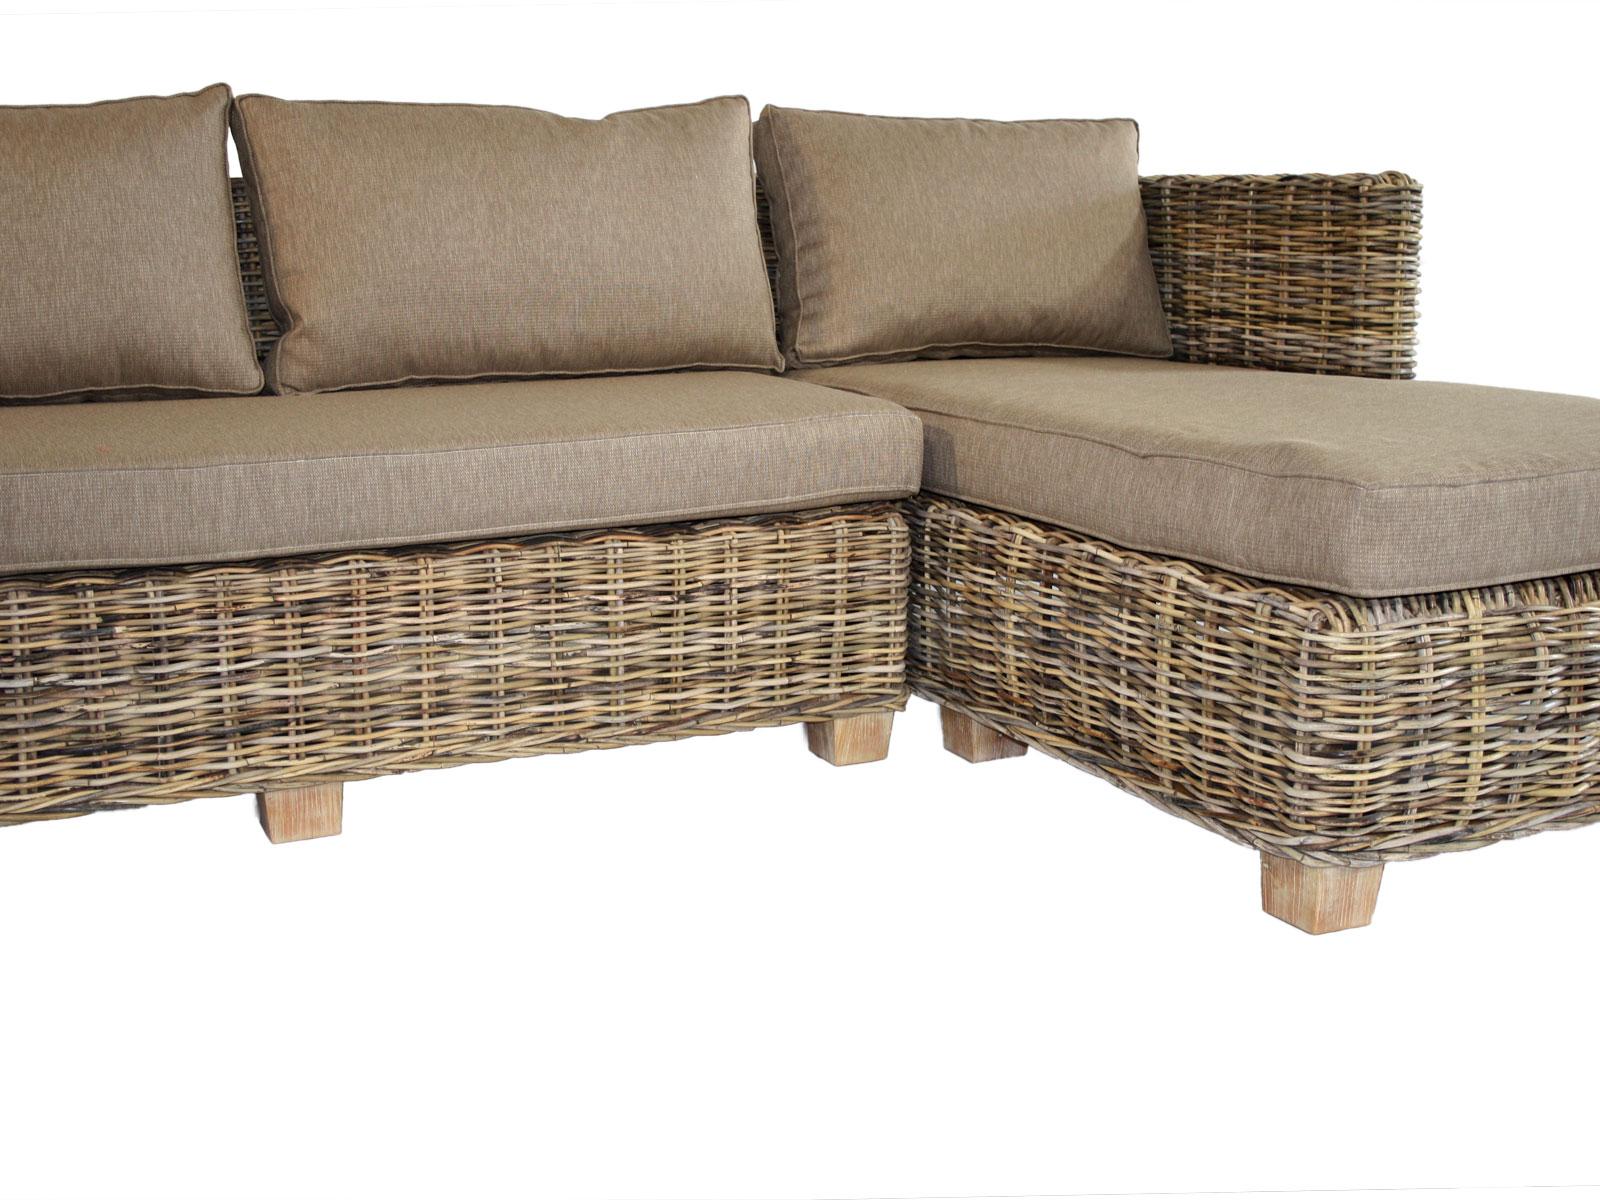 Full Size of Rattan Sofa Corner Cushions Furniture Table Cover Indoor Outdoor Set For Sale Philippines Sectional Singapore In Manila Sets Uk Halbrund Alcantara Antik Big Sofa Rattan Sofa